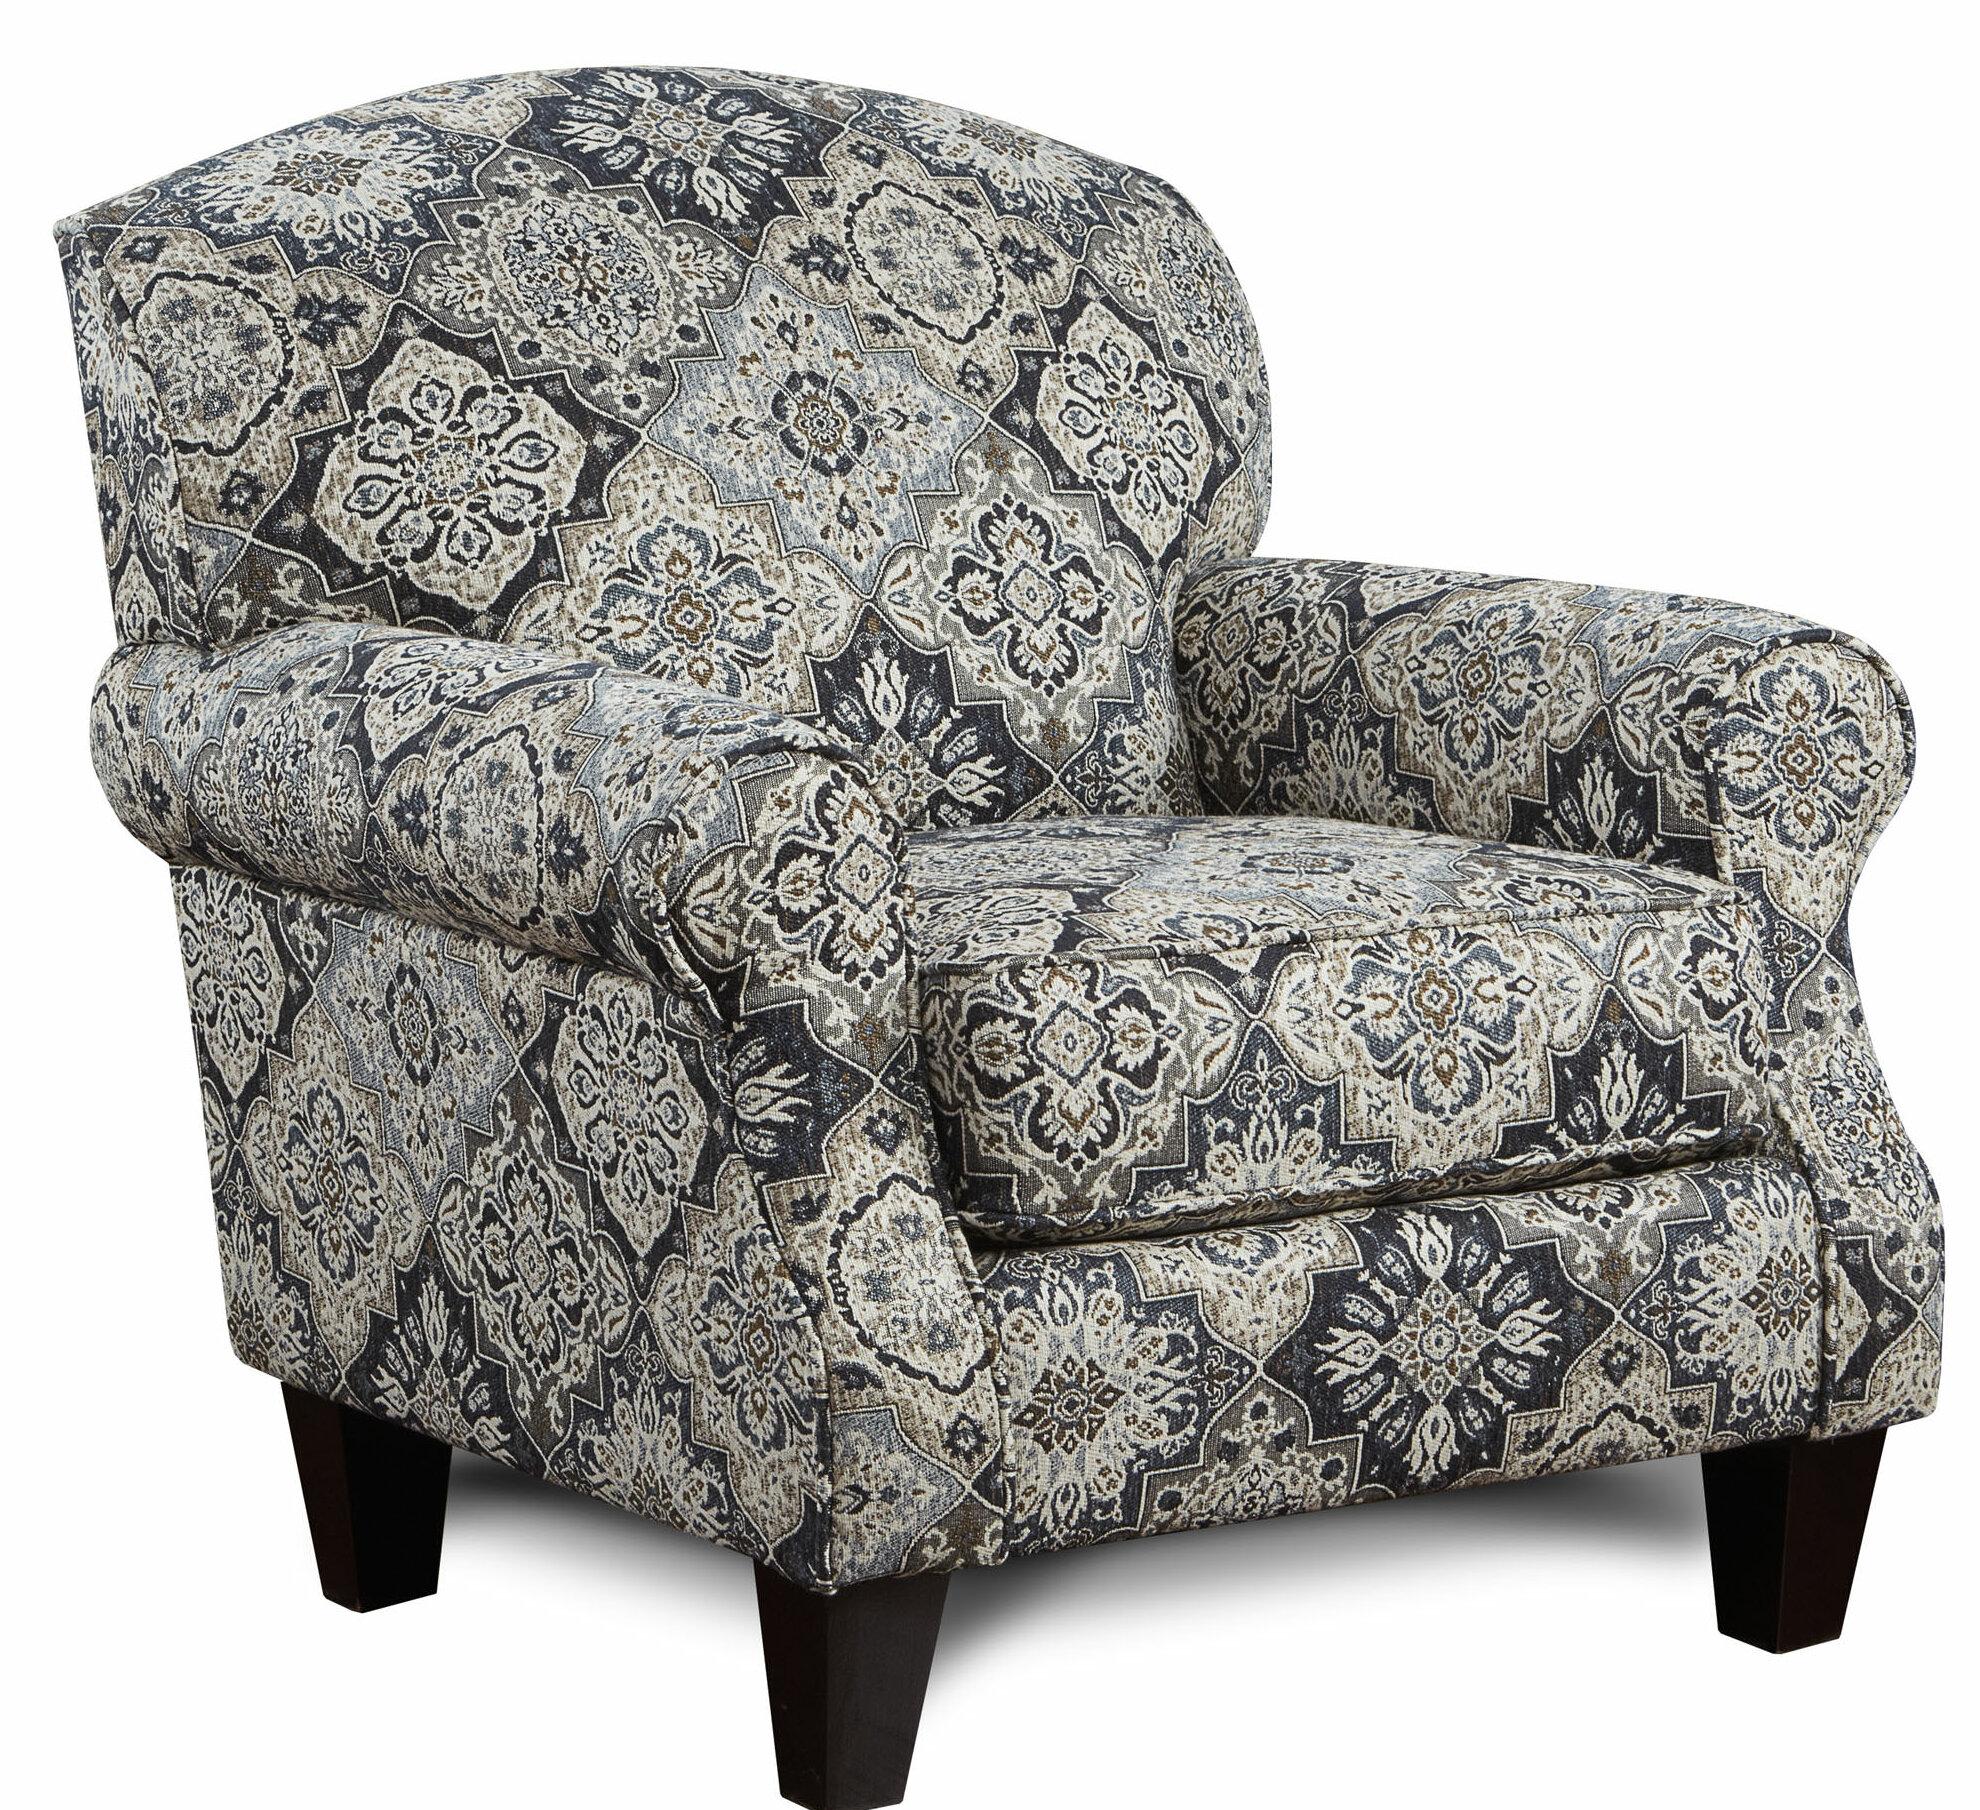 Marvelous Whitaker Armchair Lamtechconsult Wood Chair Design Ideas Lamtechconsultcom